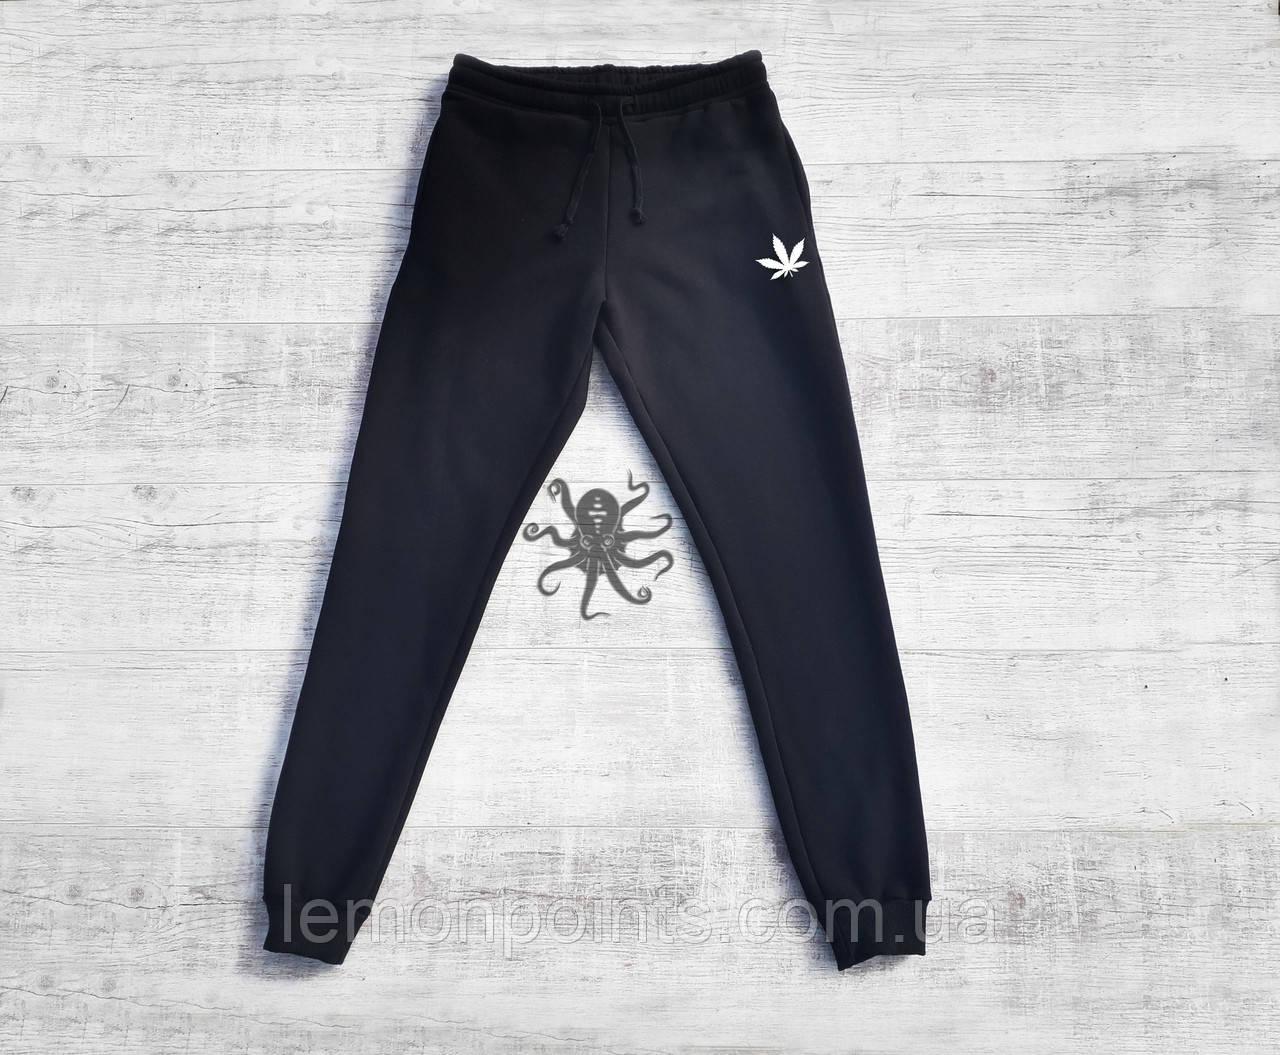 Мужские спортивные штаны, чоловічі спортивні штани Марихуана черные